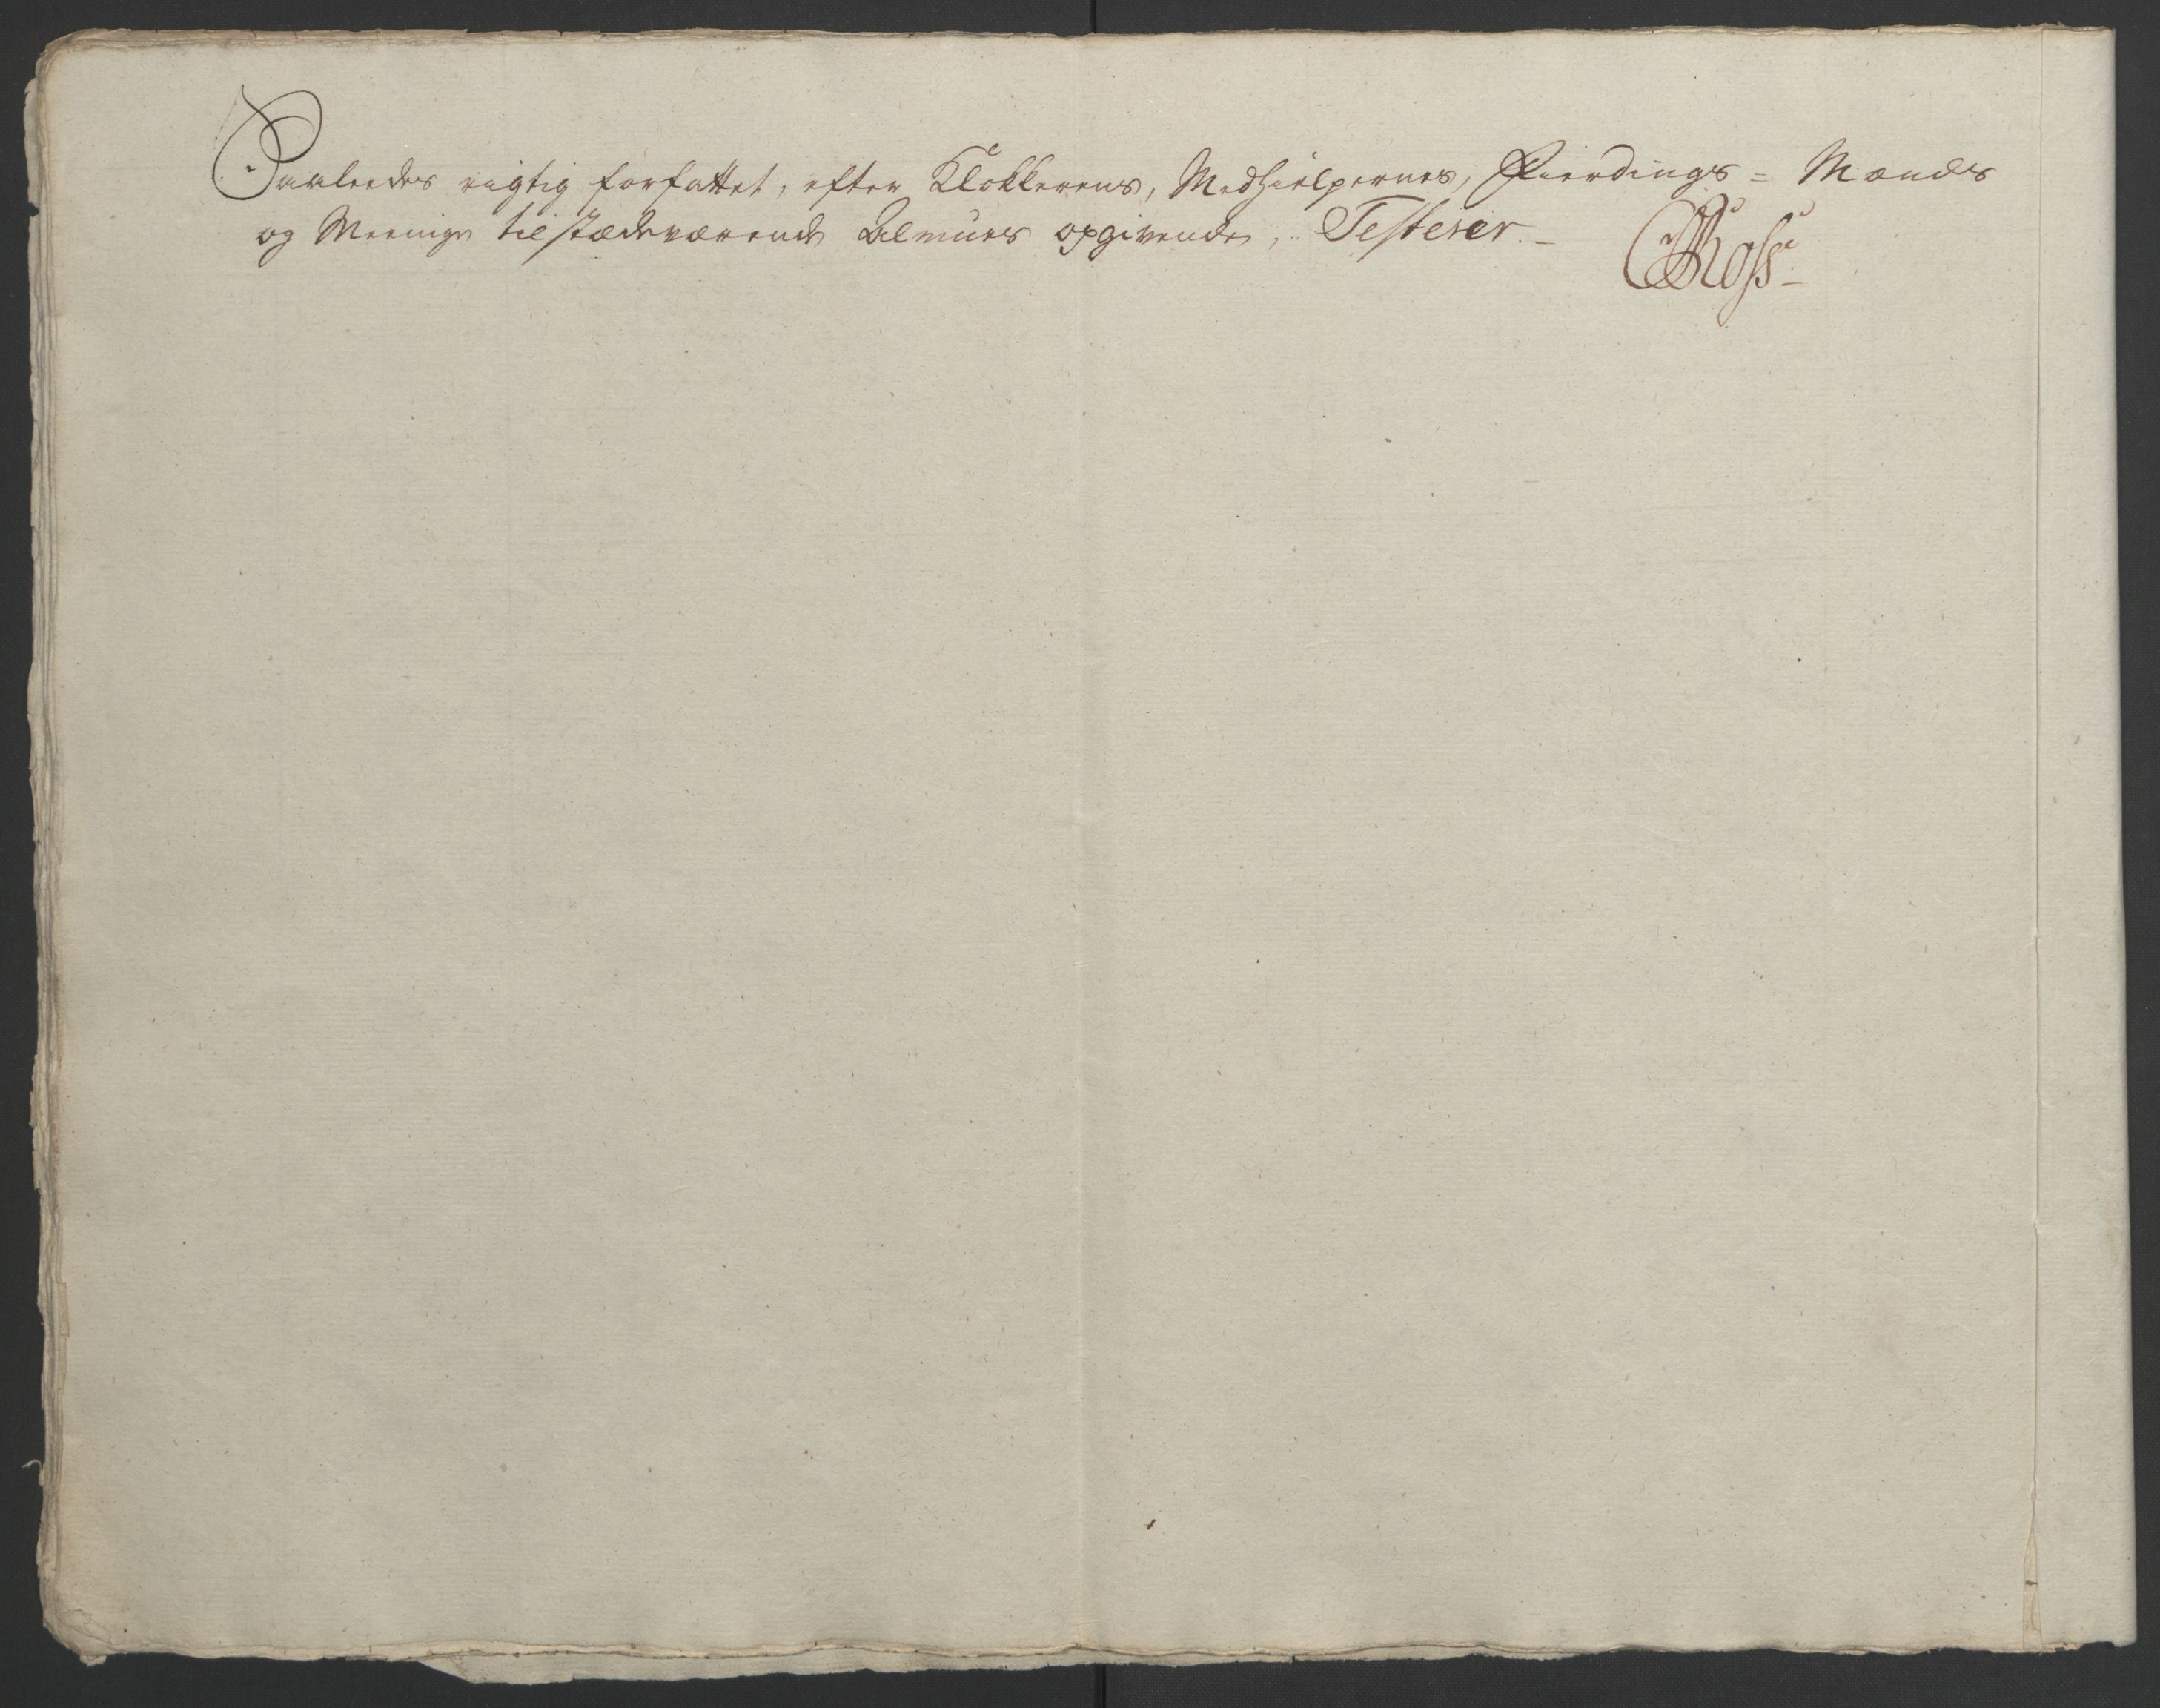 RA, Rentekammeret inntil 1814, Realistisk ordnet avdeling, Ol/L0021: [Gg 10]: Ekstraskatten, 23.09.1762. Orkdal og Gauldal, 1762-1767, s. 404